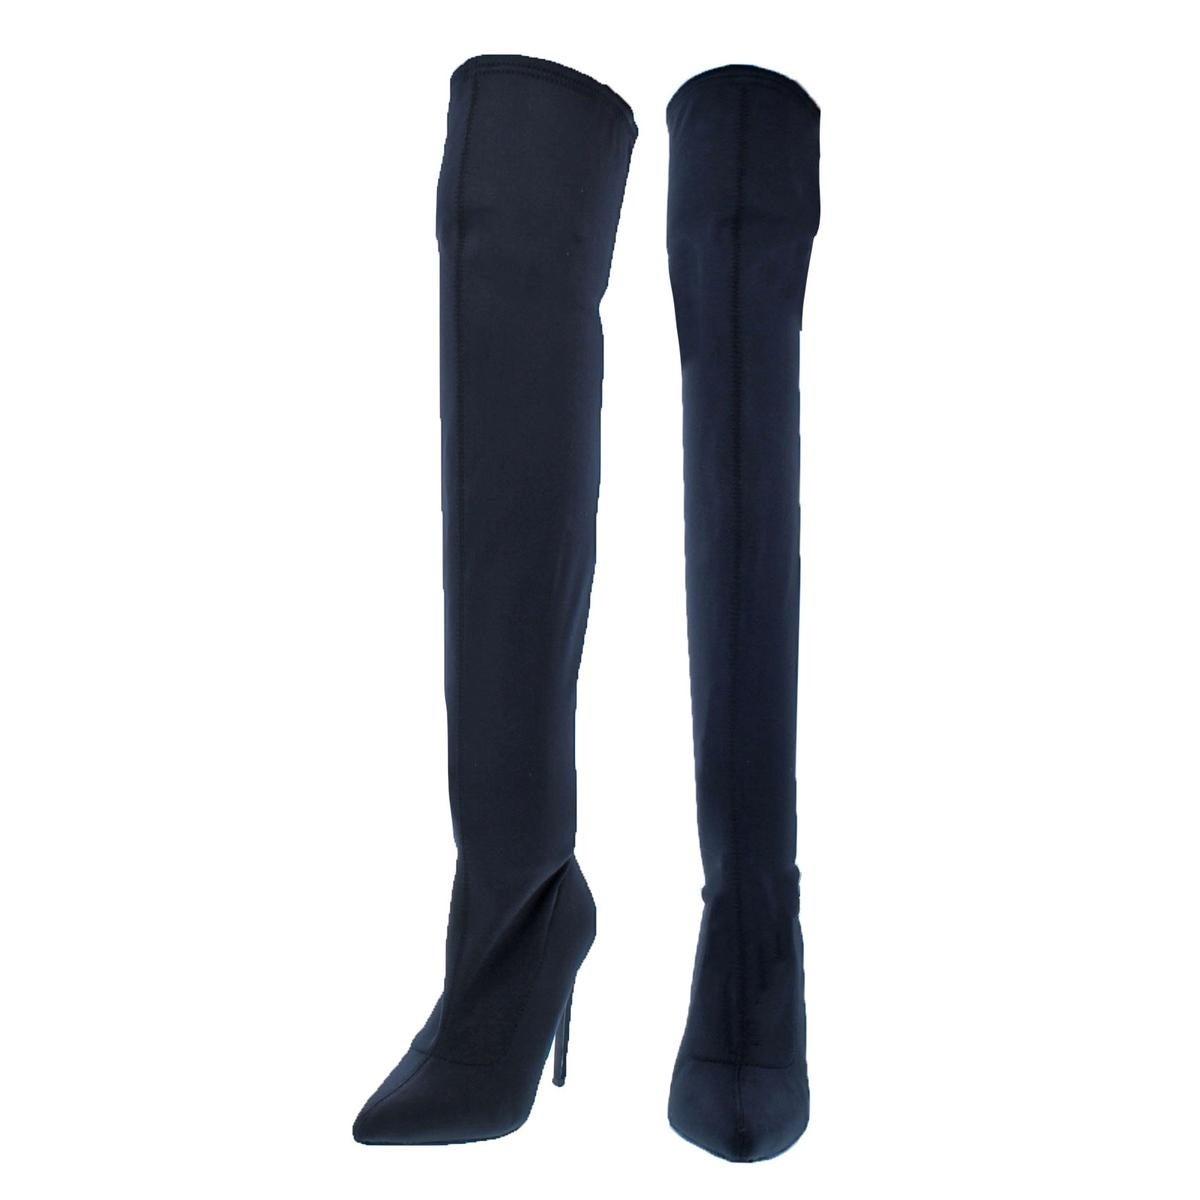 3a10053e221 Shop Steve Madden Womens Slammin Over-The-Knee Boots Pointed Toe Stiletto -  6.5 Medium (B